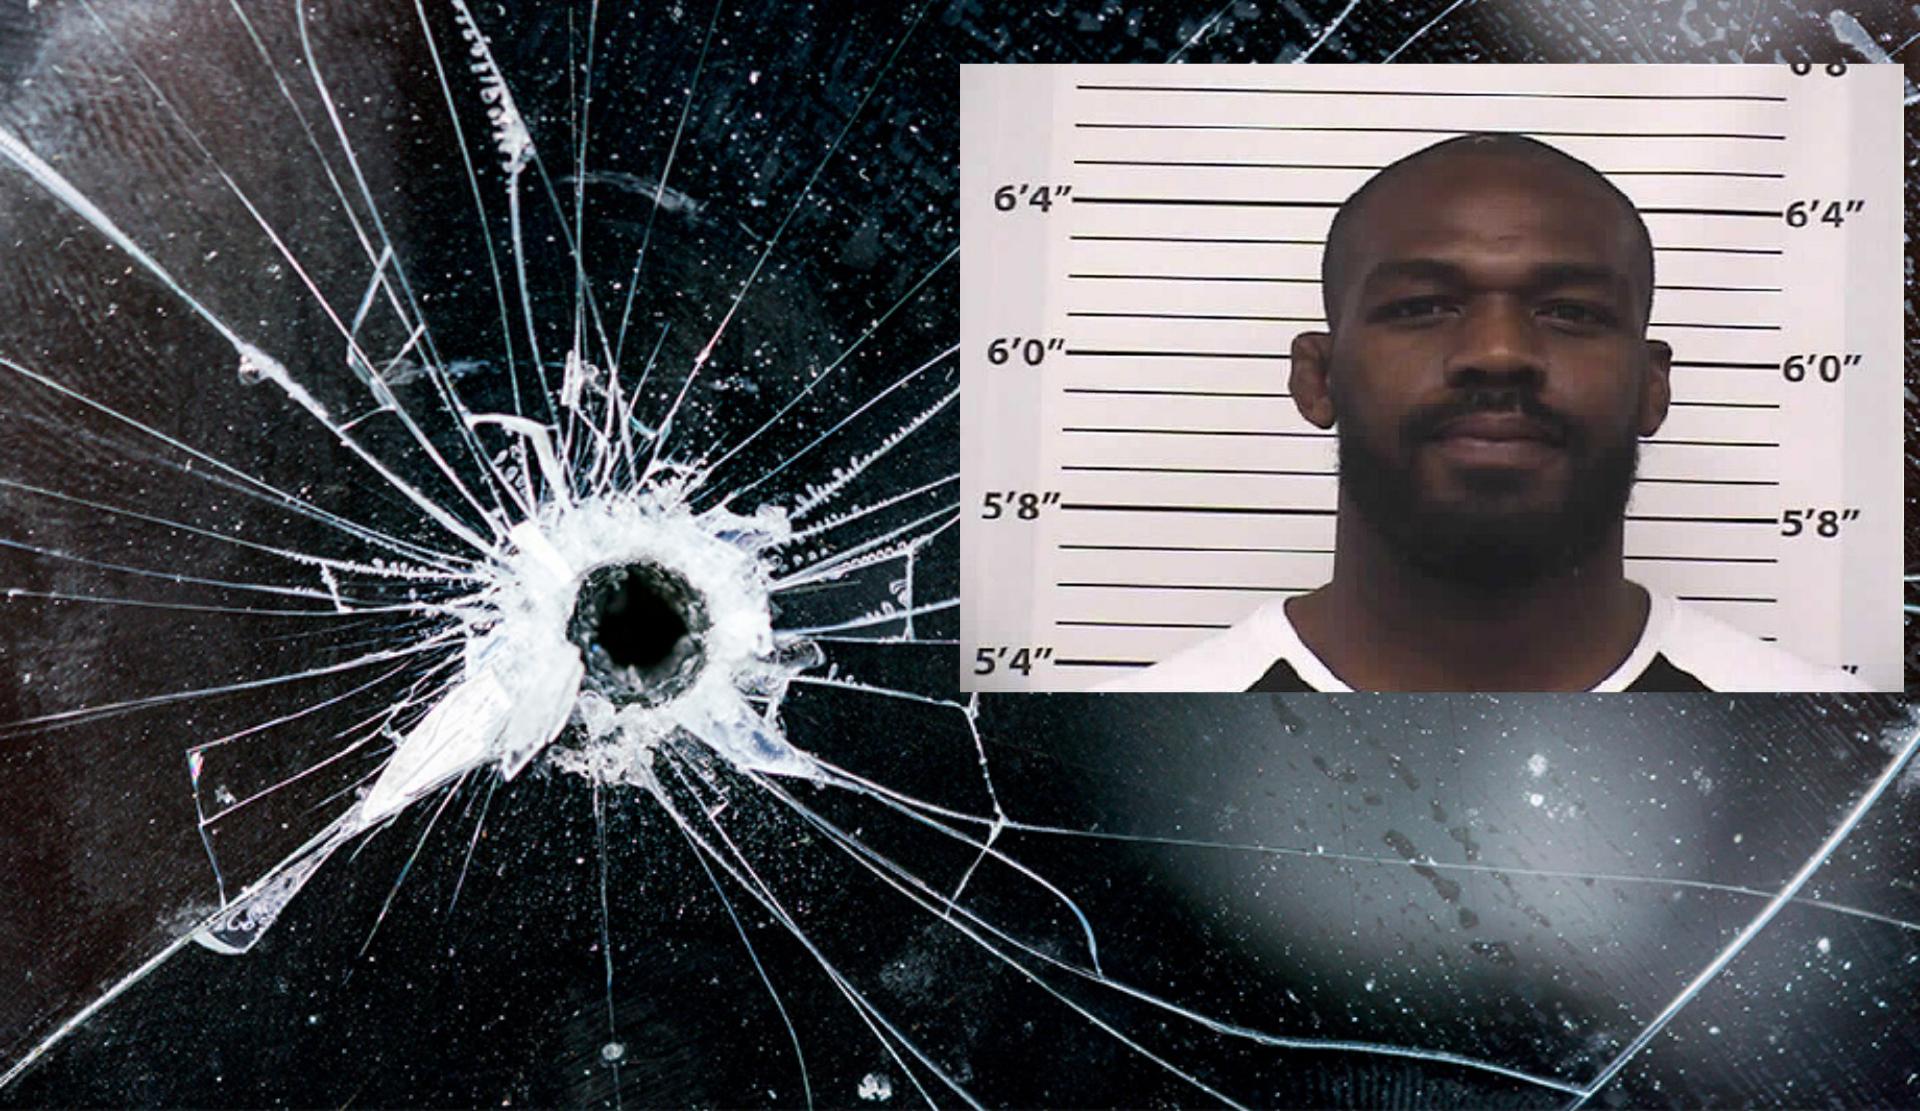 UFC News: Disturbing details emerge from police officer's account of Jon Jones' arrest - Jon